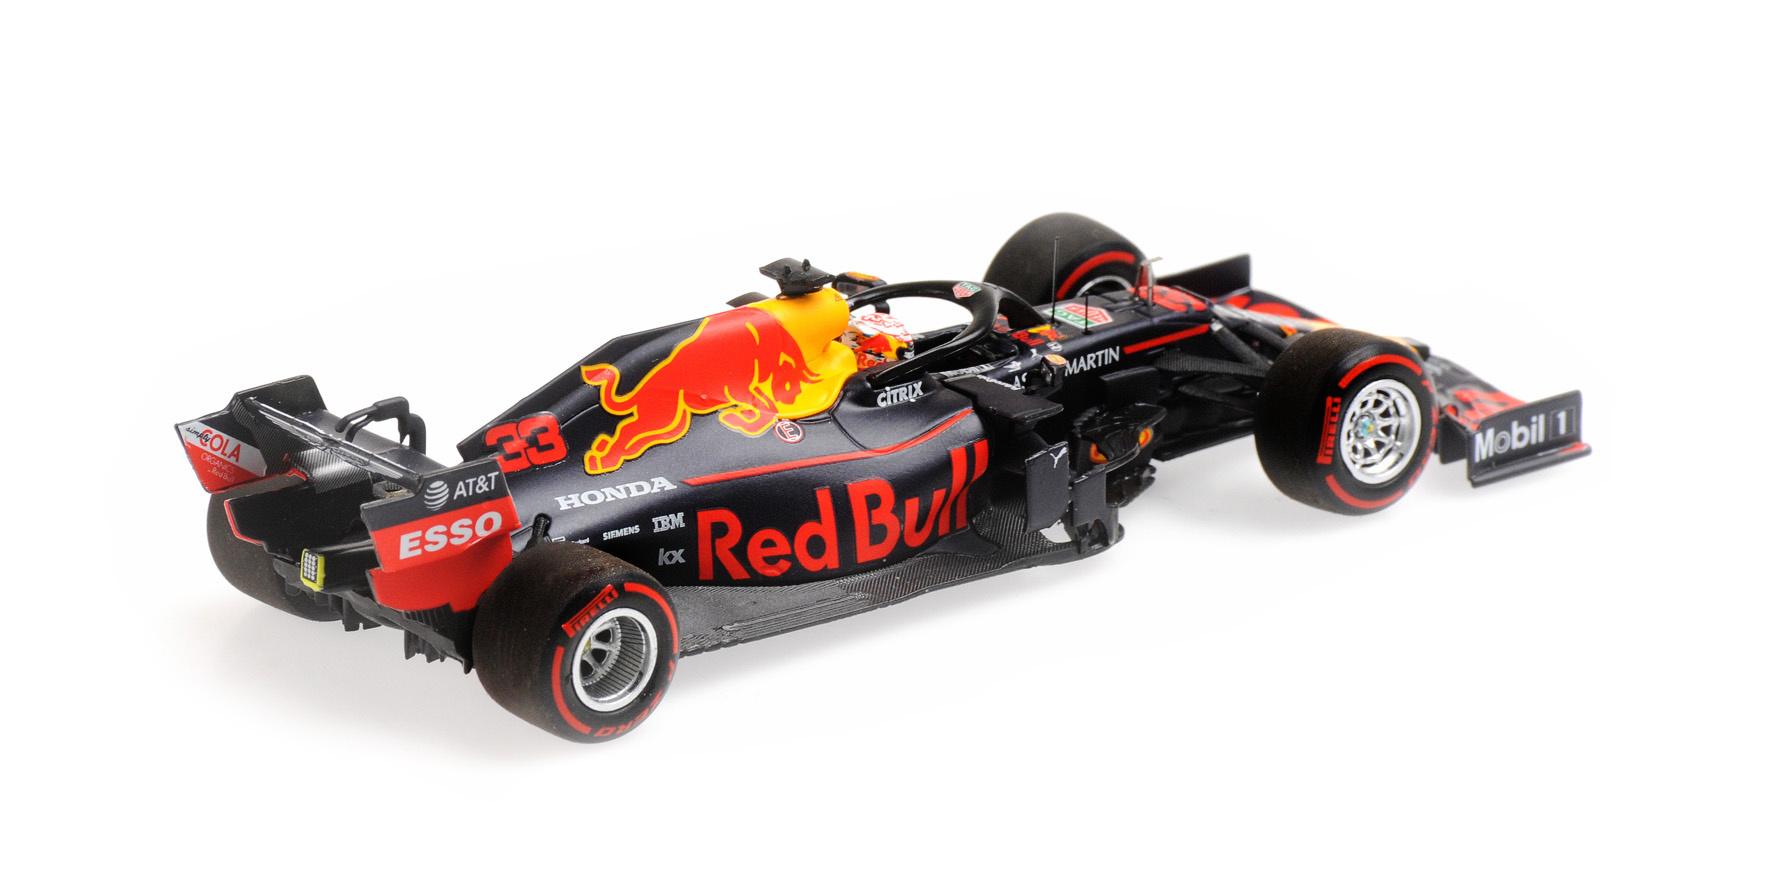 Minichamps Max Verstappen modelauto  RB15 2019 1:43